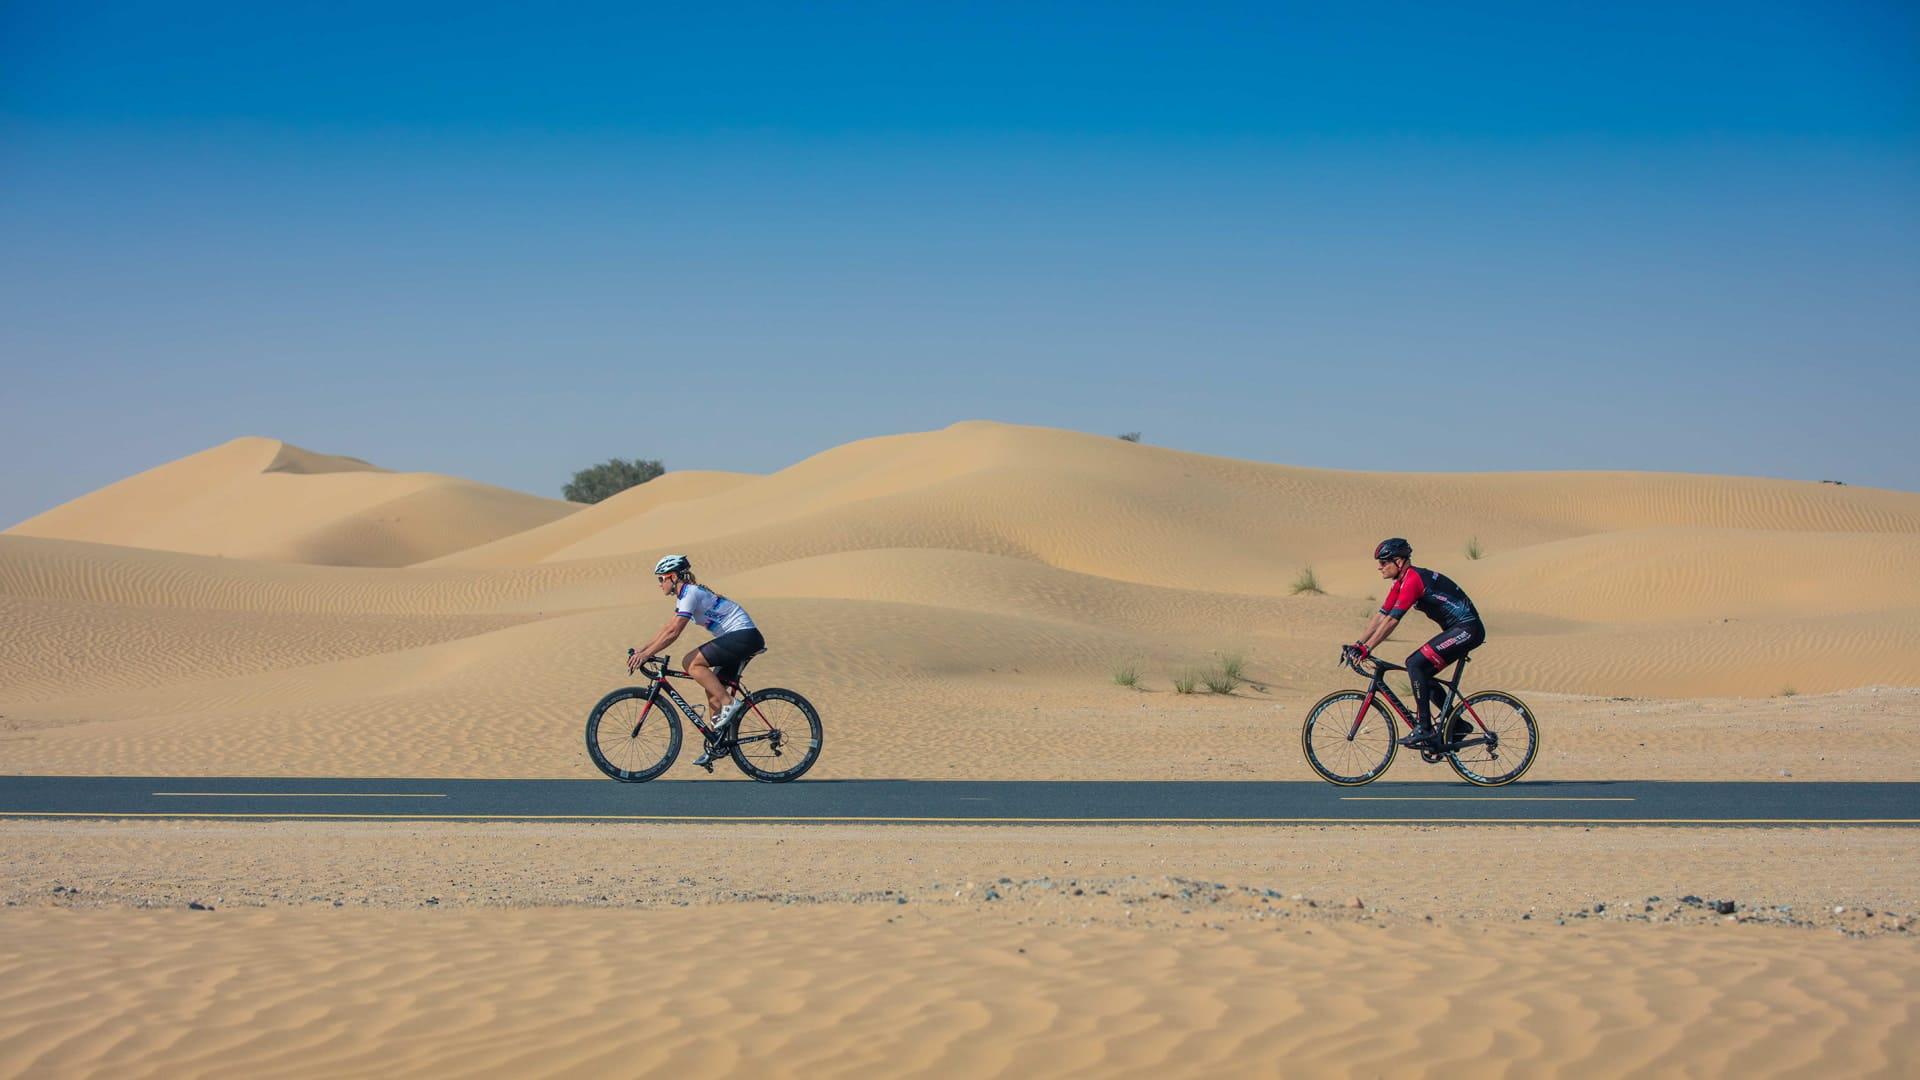 alqudra-cycling